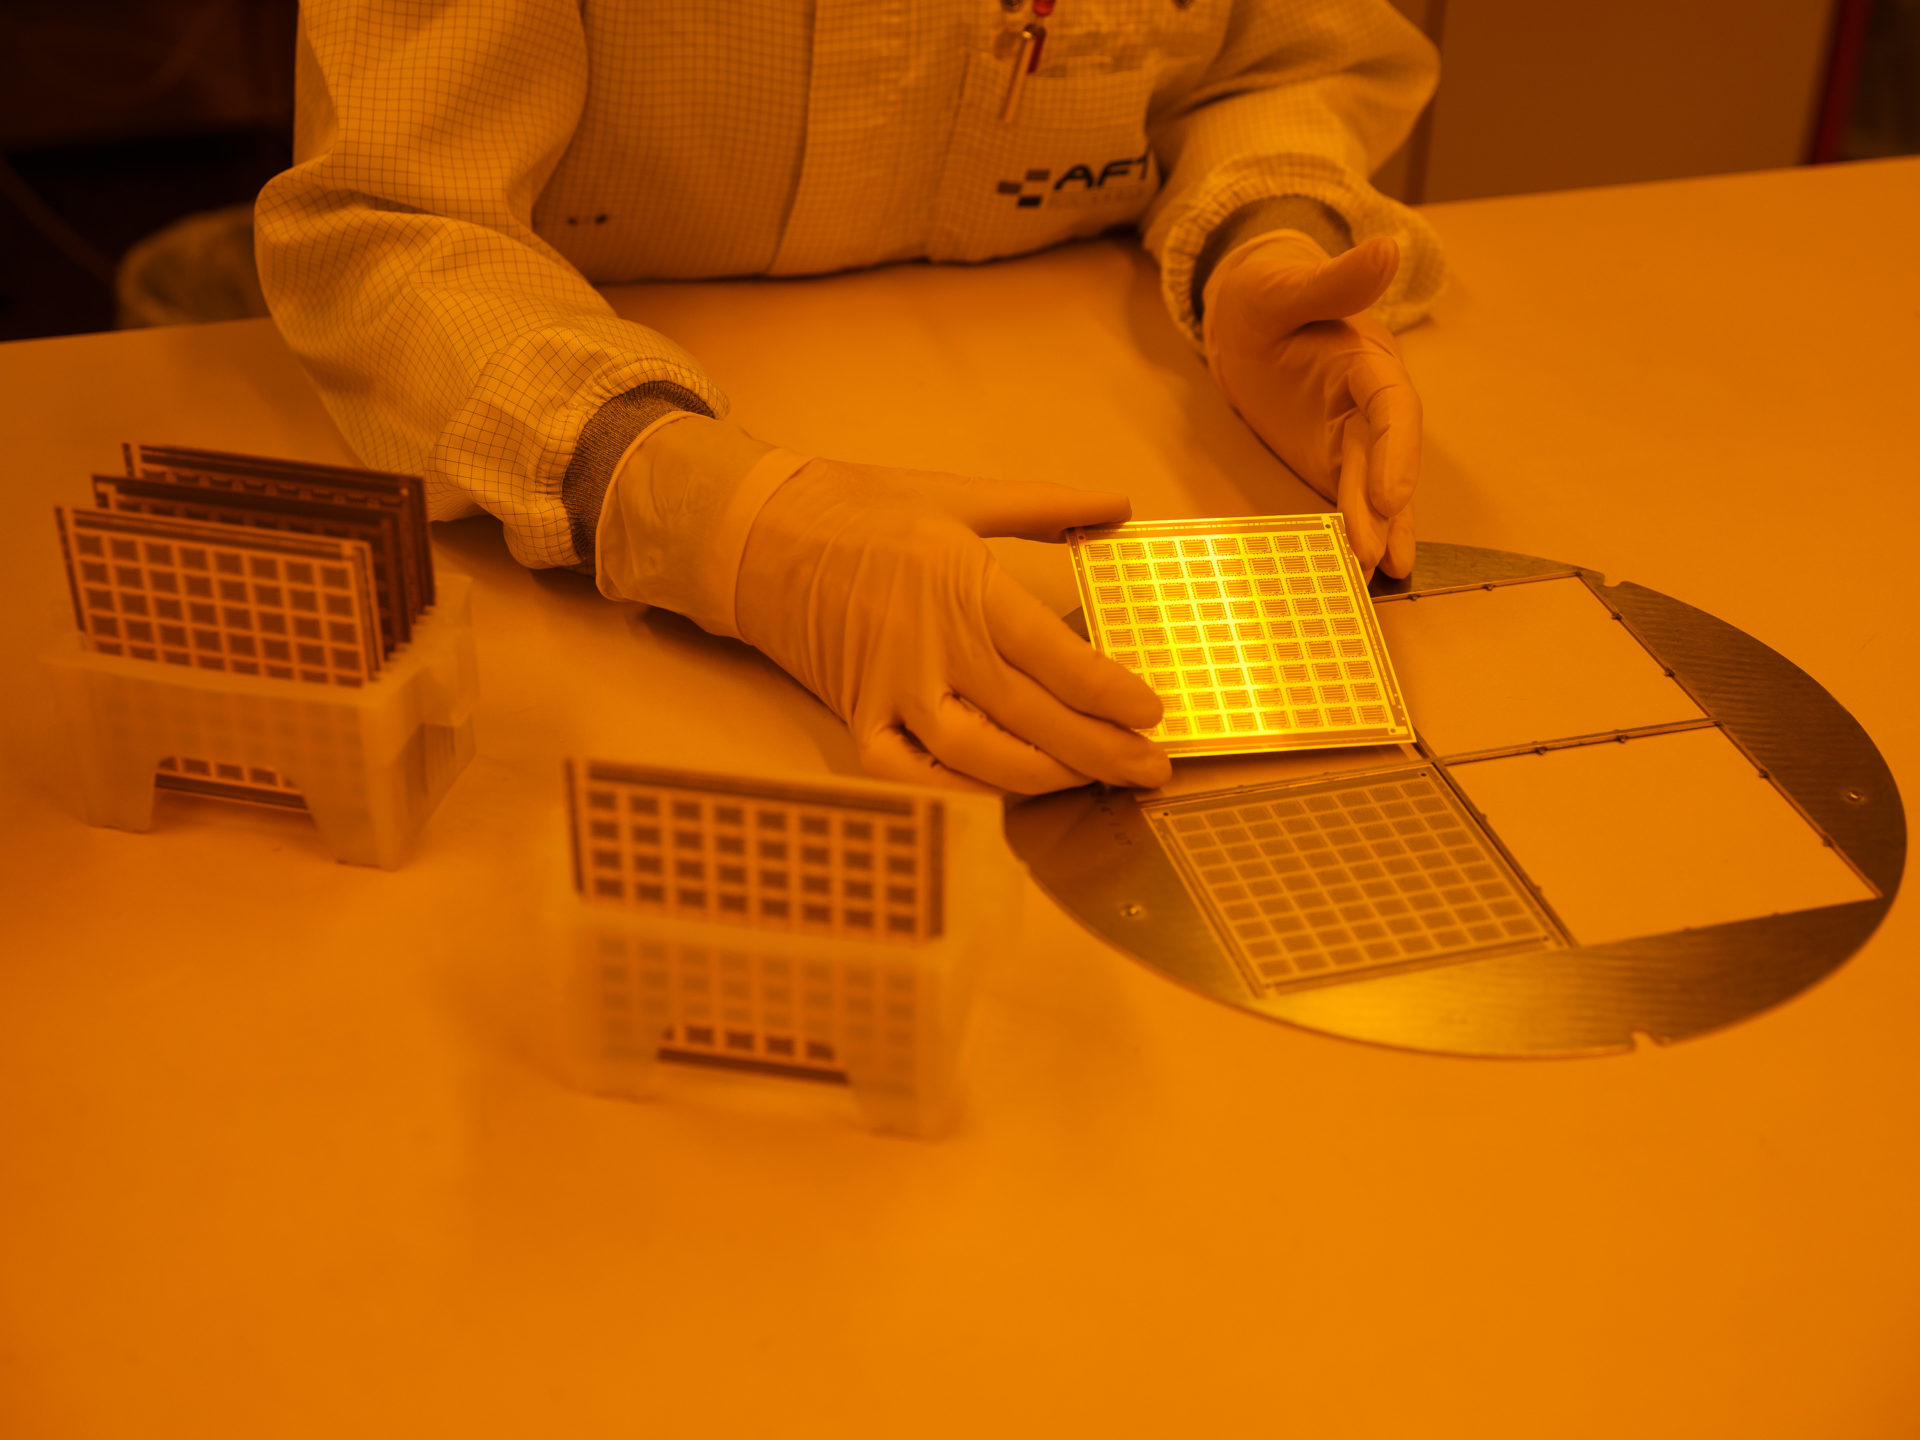 AFT Microwave, BAcknang, Dünnschicht, Herstellung, Hightech, Industrie, Industriehalle, Maschine, Produktion, Reinraum, Sachaufnahme, Werk